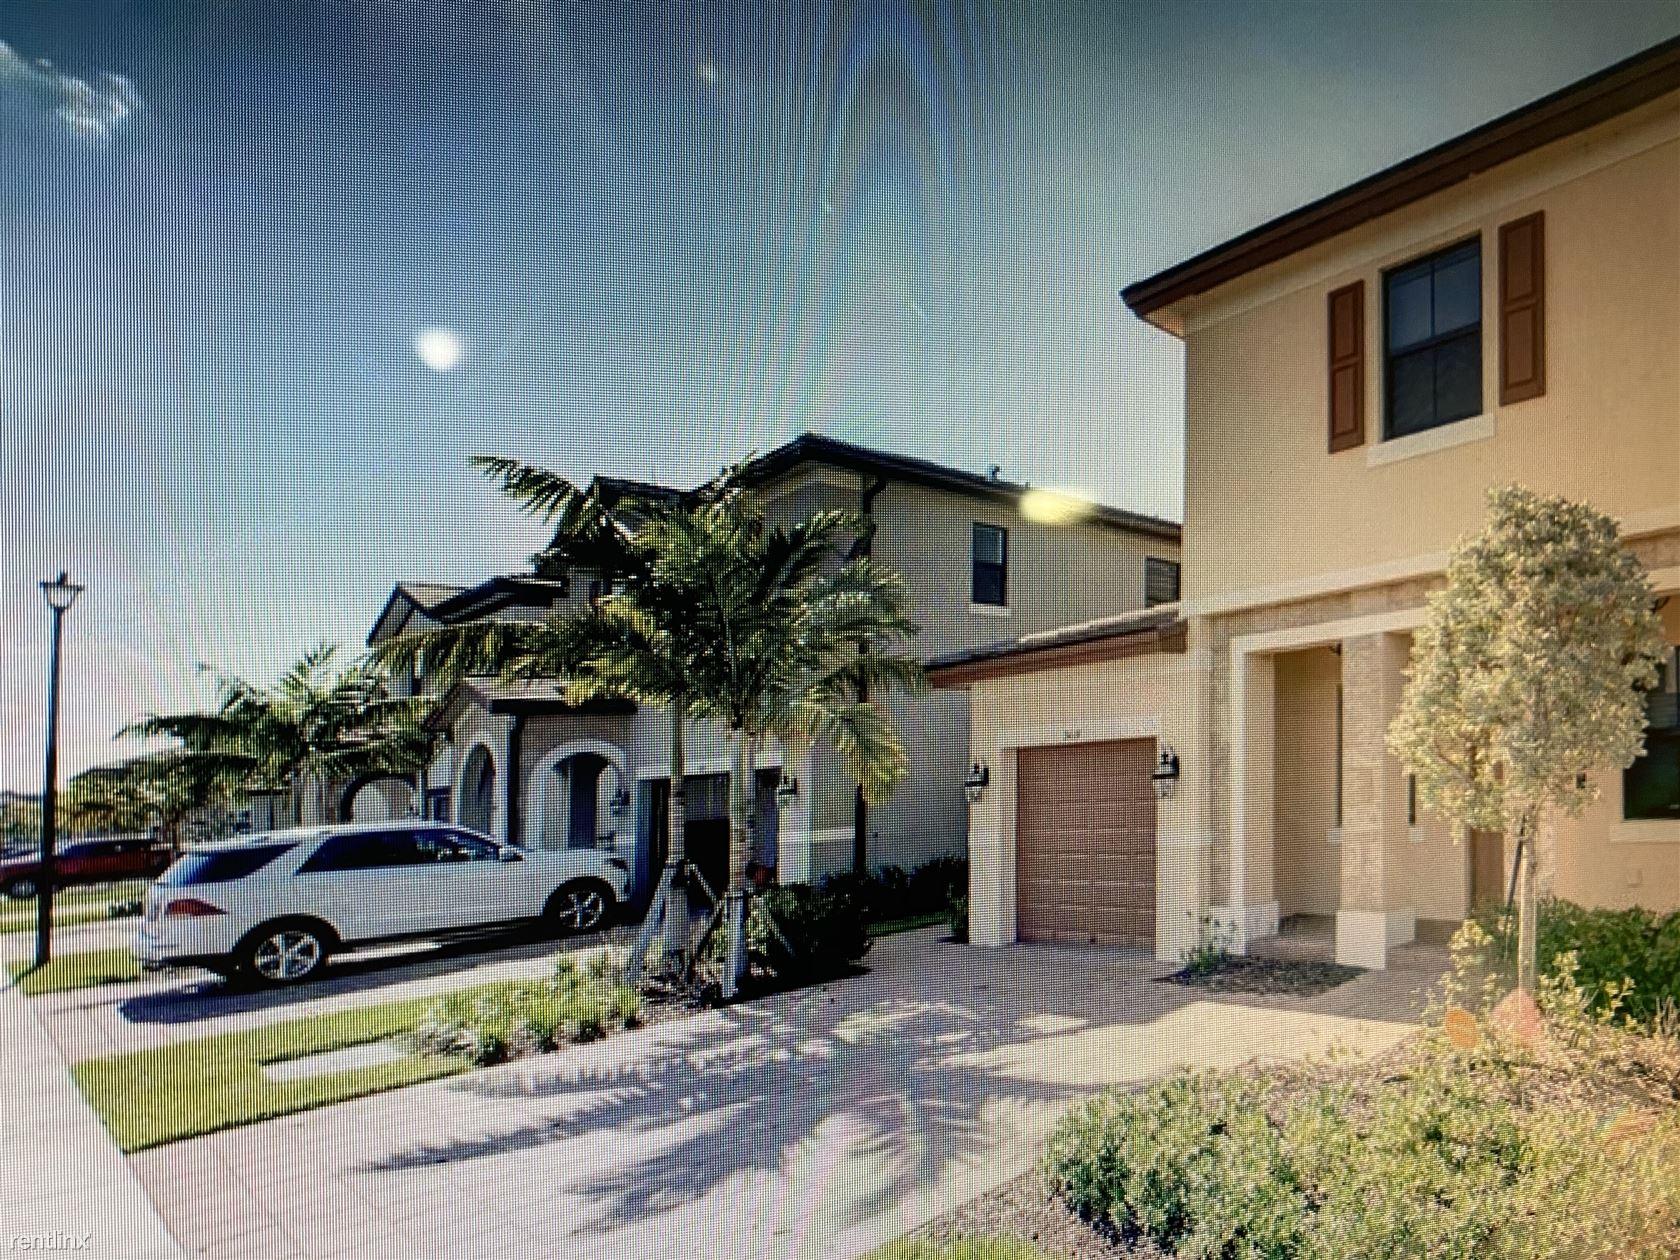 3419 W 100th Ter, Hialeah, FL - $3,950